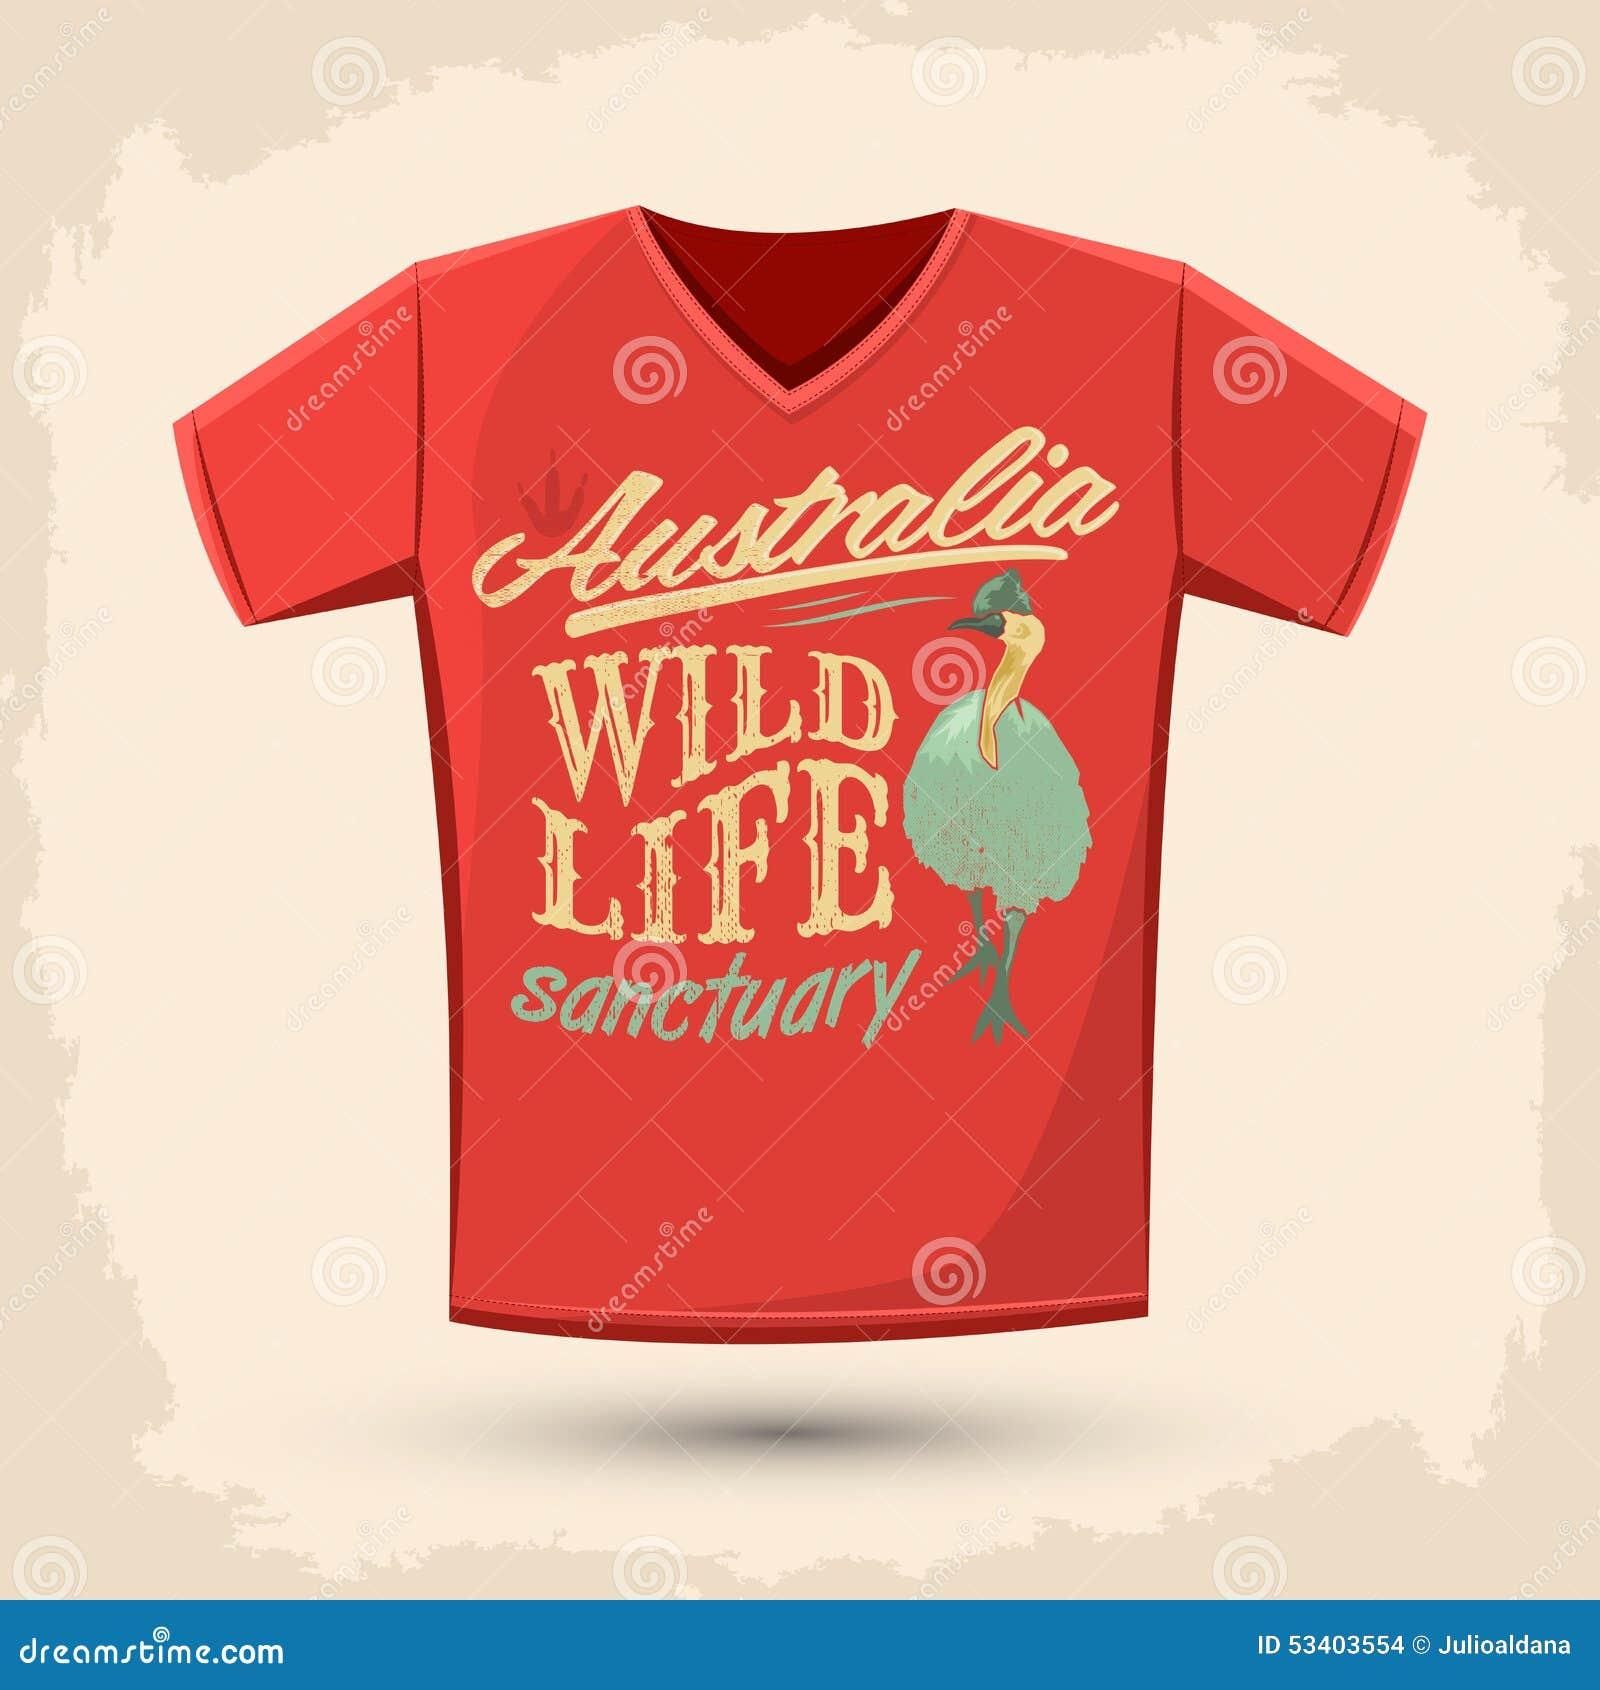 Graphic T Shirt Design Australian Wild Life Sanctuary Stock